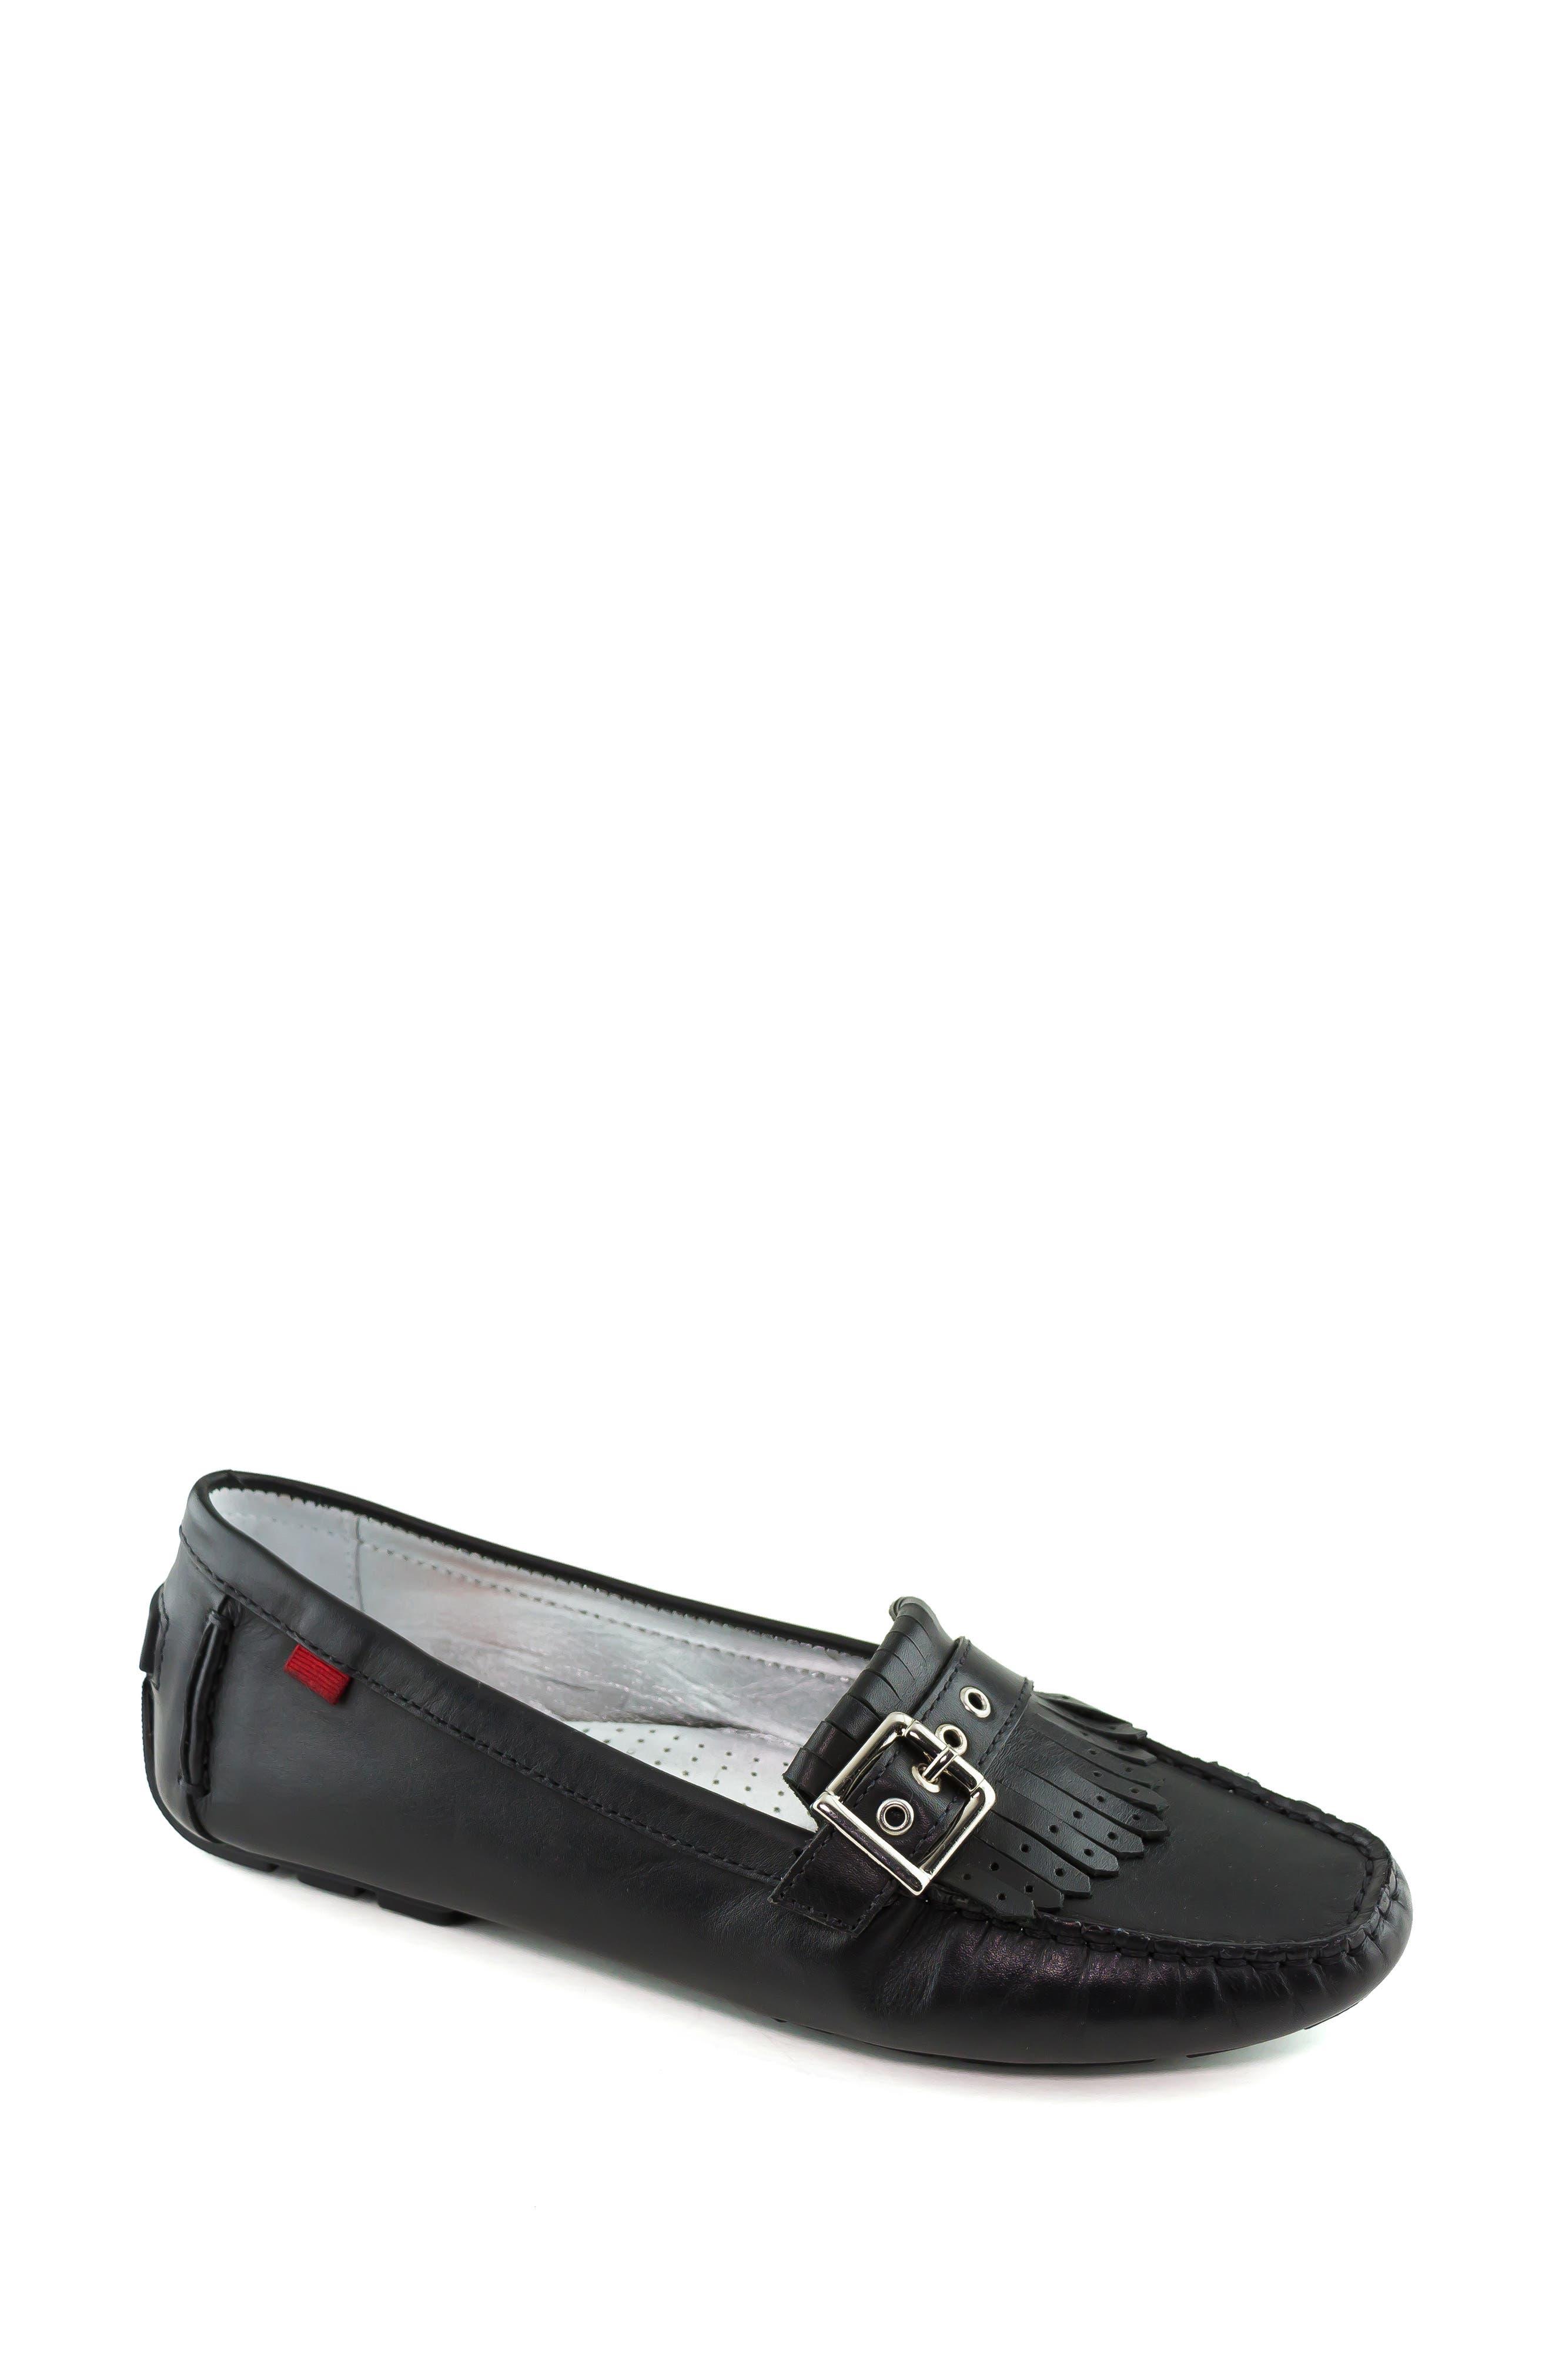 Marc Joseph New York South Street Loafer, Black